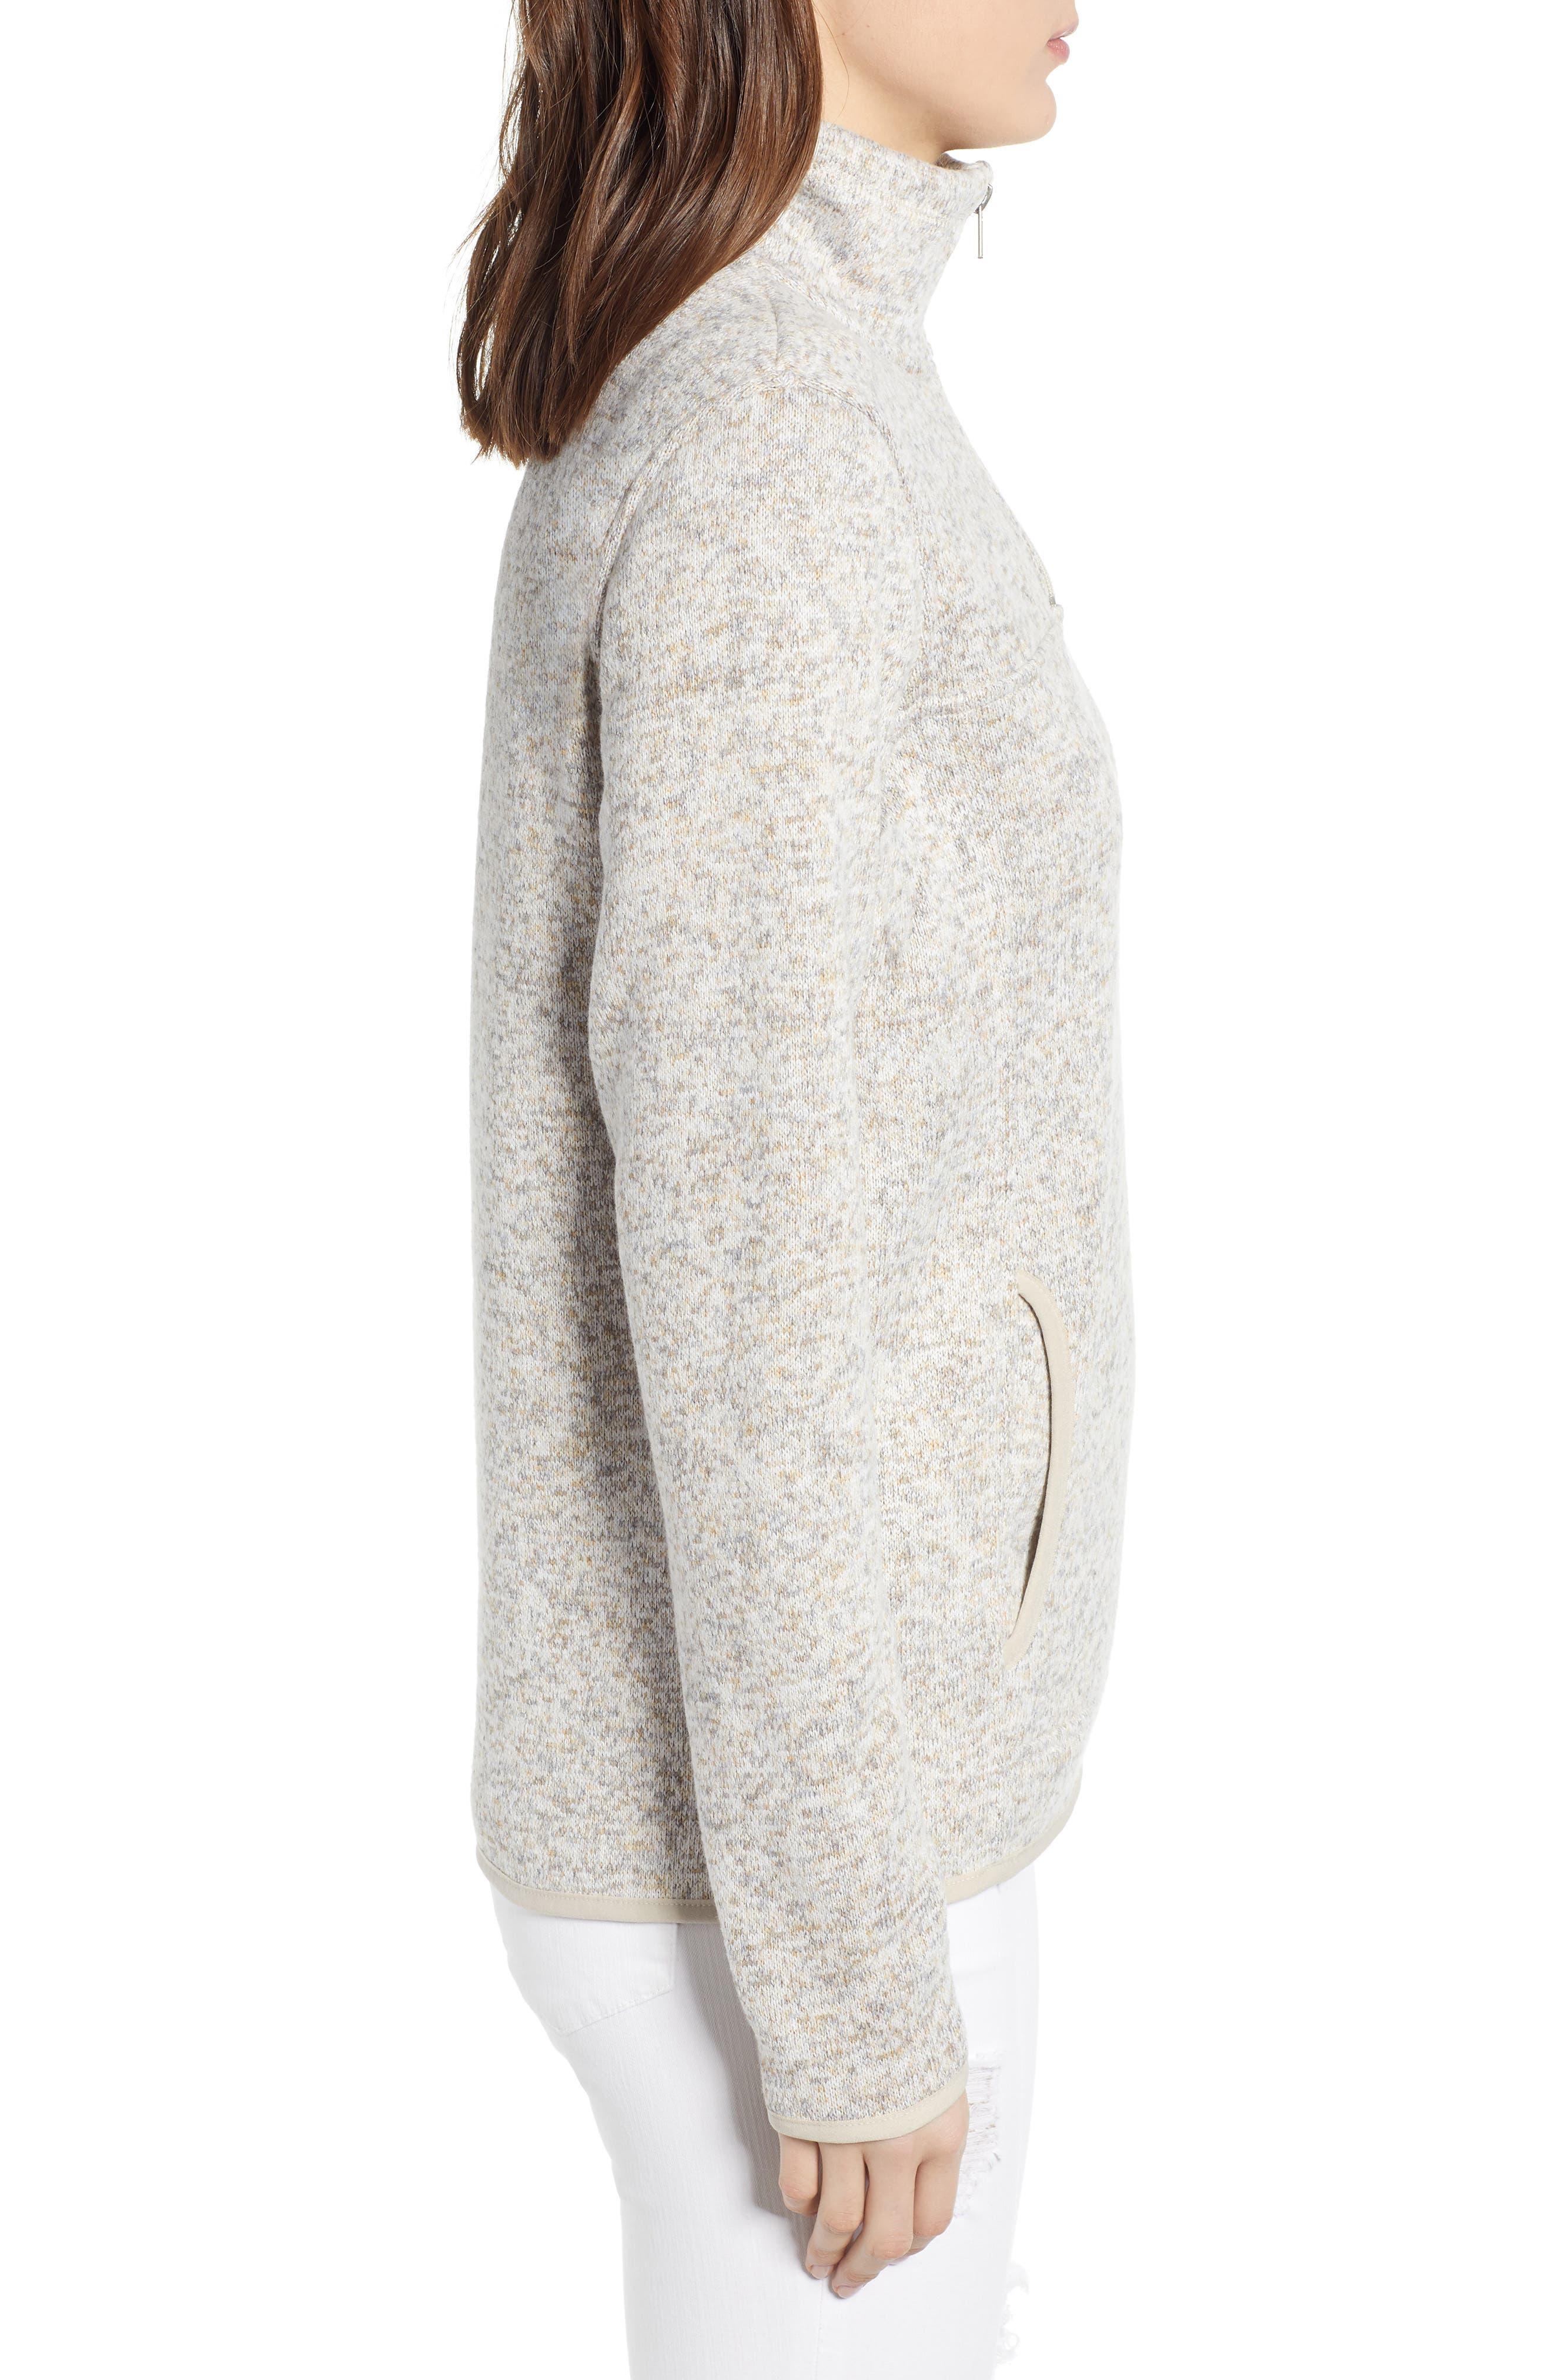 THREAD & SUPPLY, Madison Fleece Jacket, Alternate thumbnail 3, color, HEATHER OATMEAL